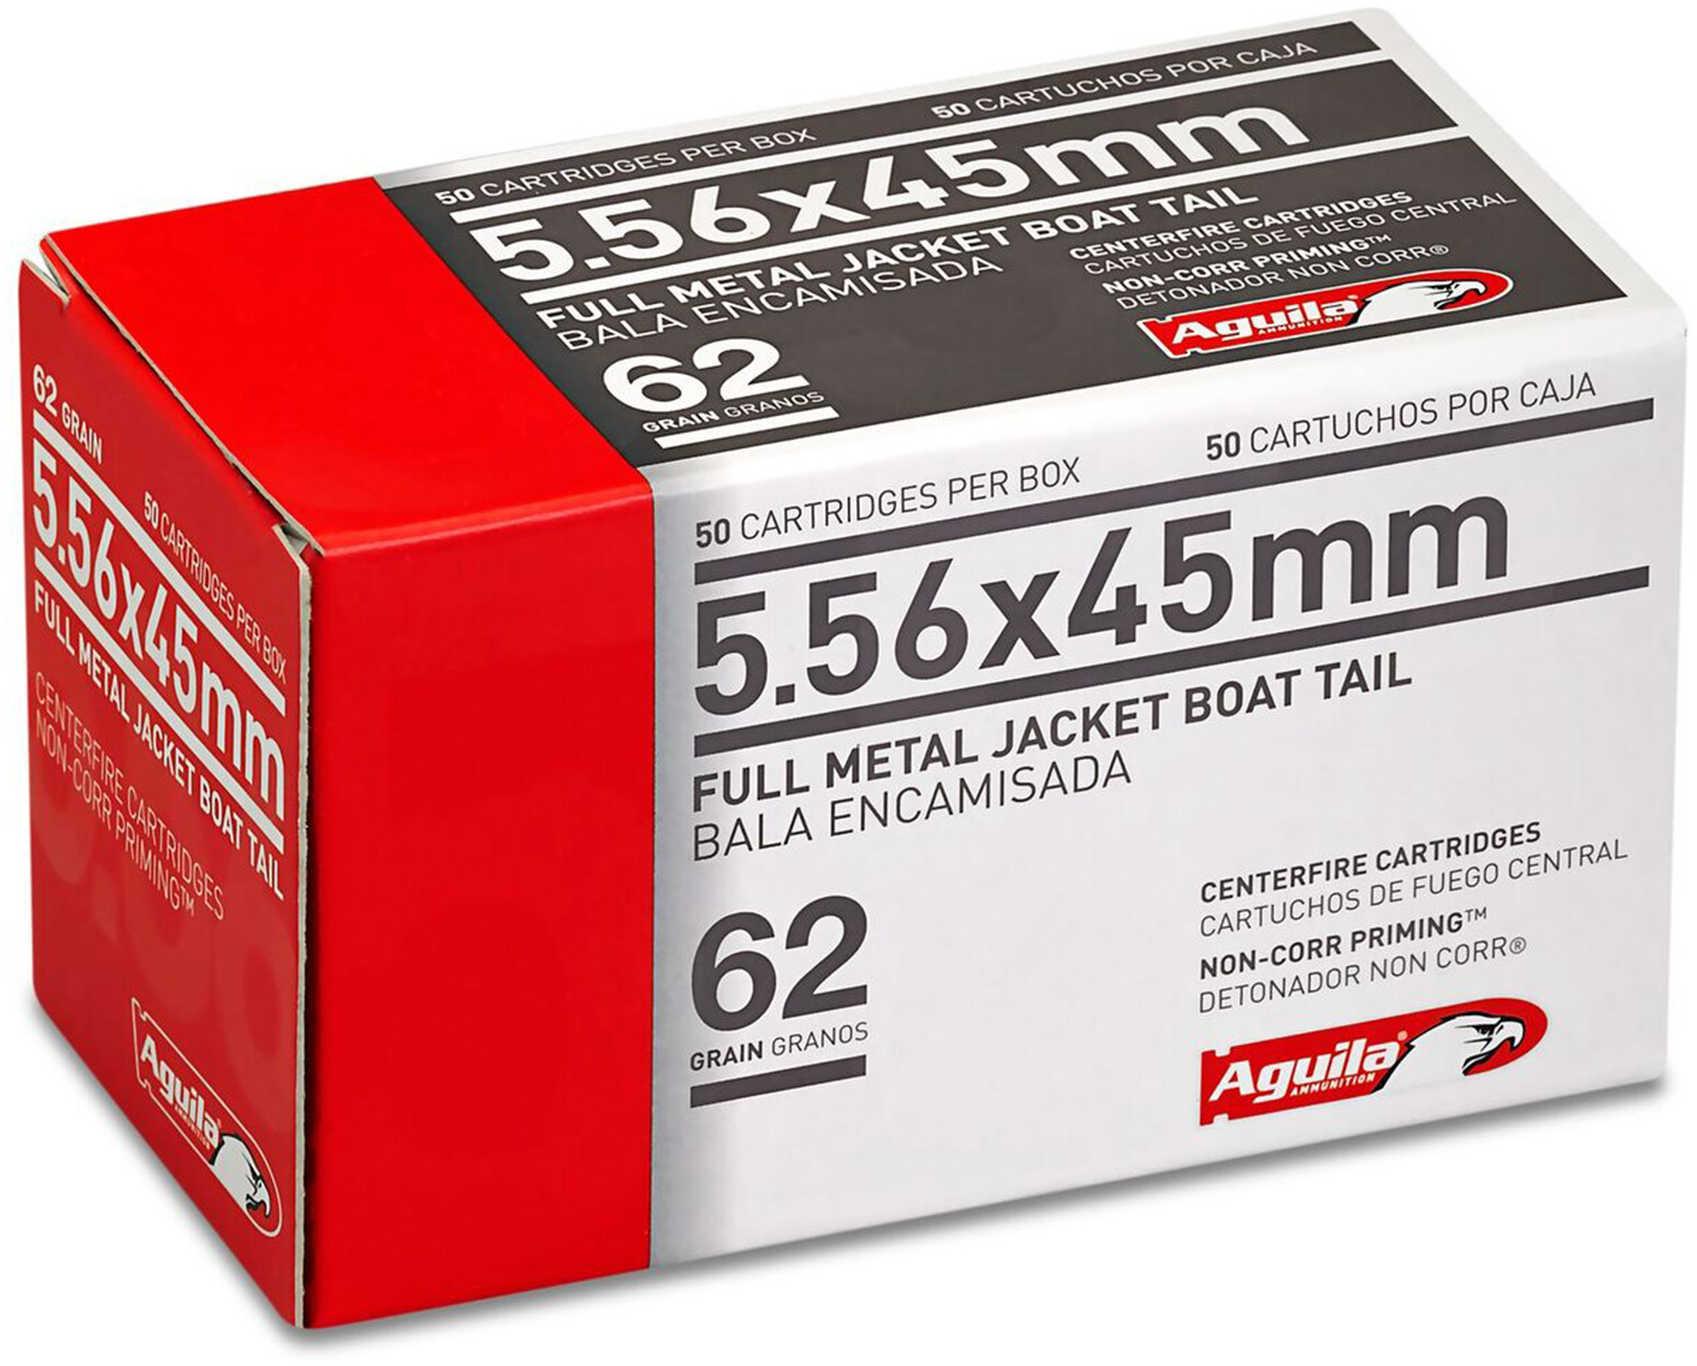 Aguila 1E556110 Rifle 223 Rem/5.56NATO 62 GR Full Metal Jacket Boat Tail (FMJBT) 50 Box